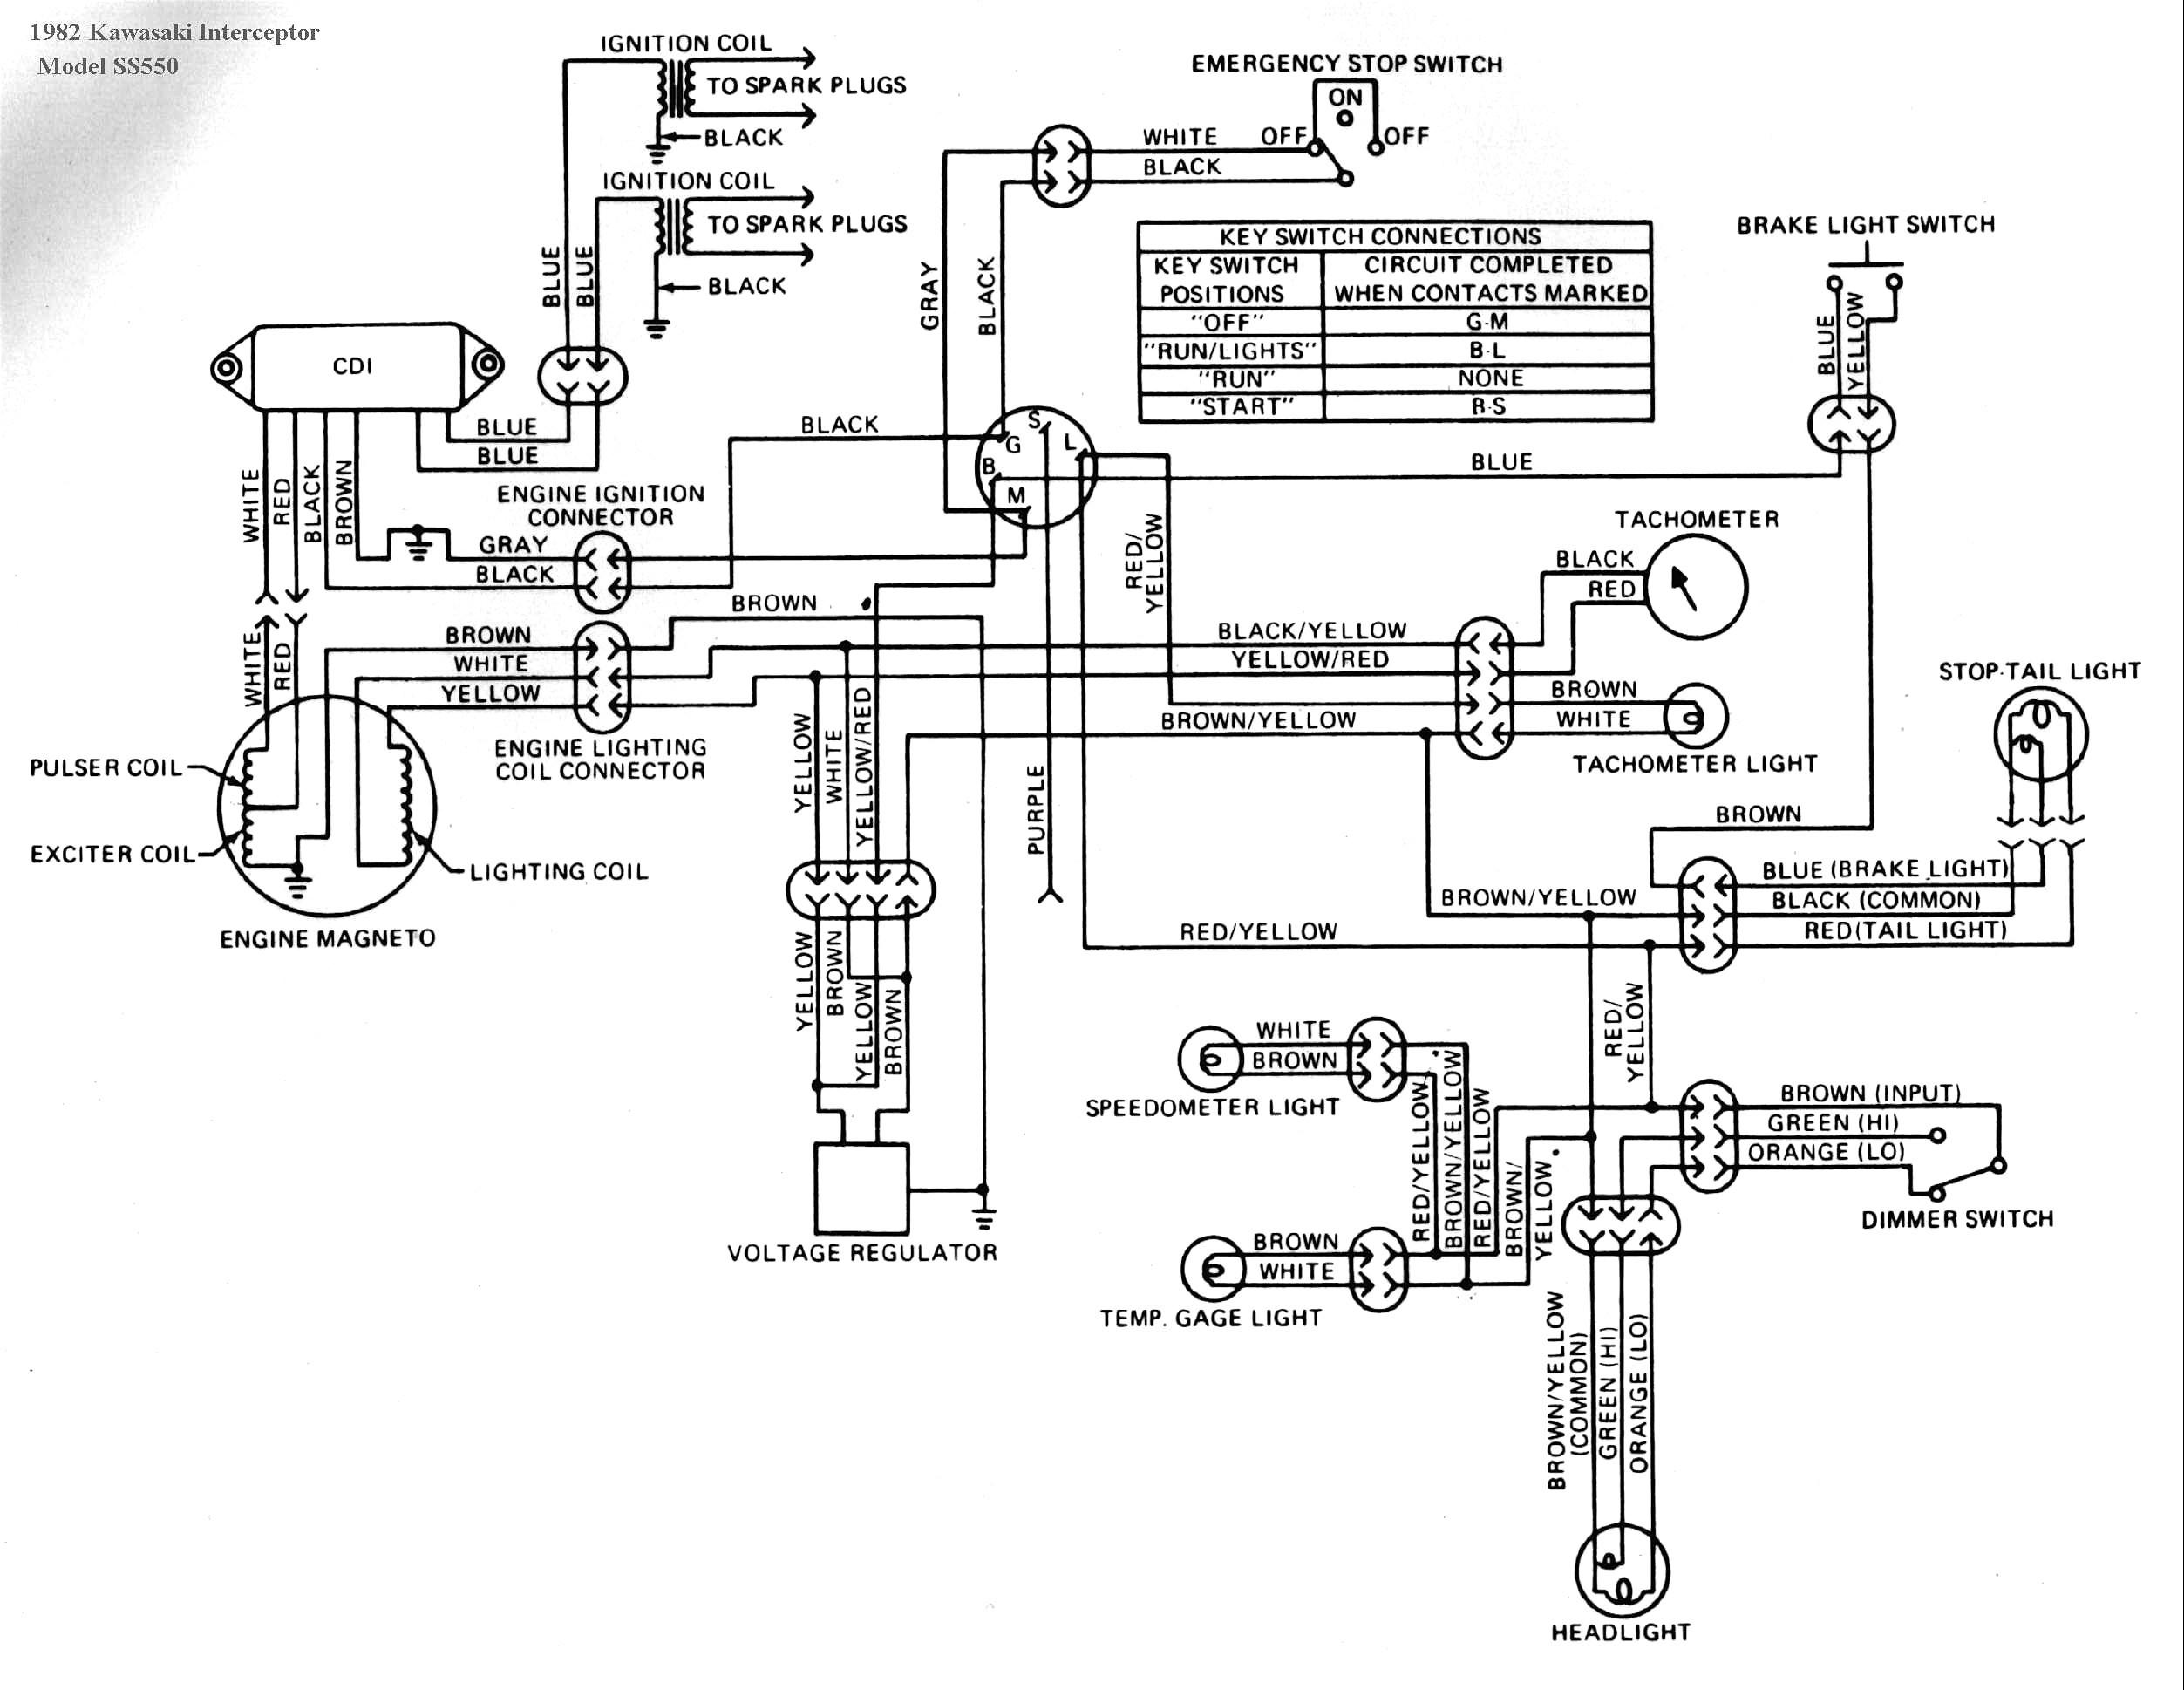 Kawasaki 750ss Wiring Diagram | Wiring Diagram Centre on cub cadet 100 wiring diagram, kawasaki 1100 zxi wiring-diagram, kawasaki electrical diagrams, kawasaki bayou 220 wiring diagram, john deere 100 wiring diagram, kawasaki f5, kawasaki vulcan 800 wiring diagram, kawasaki 400 wiring diagram, kawasaki 100 parts, kawasaki 4 wheeler wiring diagram, kawasaki b8m, kawasaki g5 wiring diagram, kawasaki bayou 300 wiring diagram, kawasaki 500 wiring diagram, kawasaki cdi wiring diagram, kawasaki atv wiring diagram, kawasaki 600 wiring diagram, audi 100 wiring diagram, kawasaki greenstreak, kawasaki 750 wiring diagram,